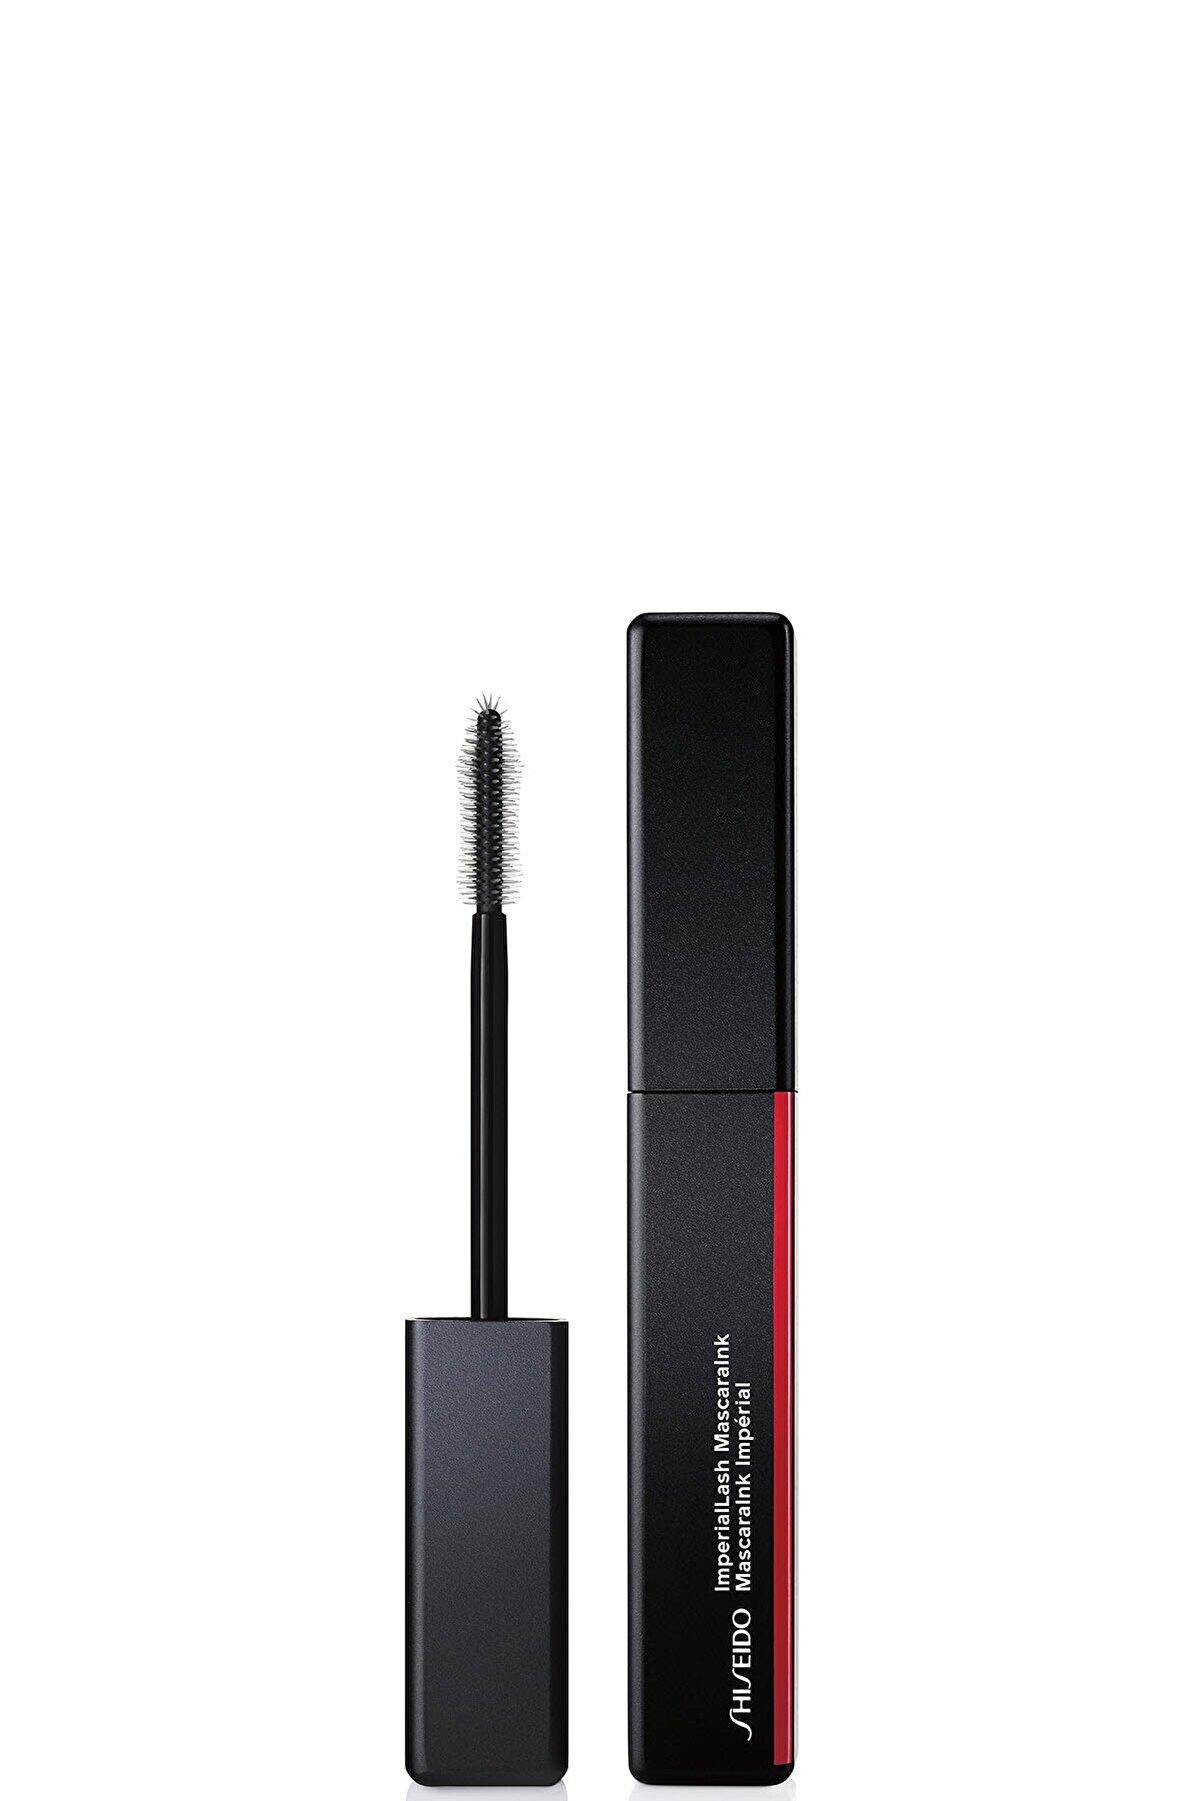 Shiseido Hacim ve Uzatma Etkili - SMK Imperiallash Mascaraink 01 730852147706